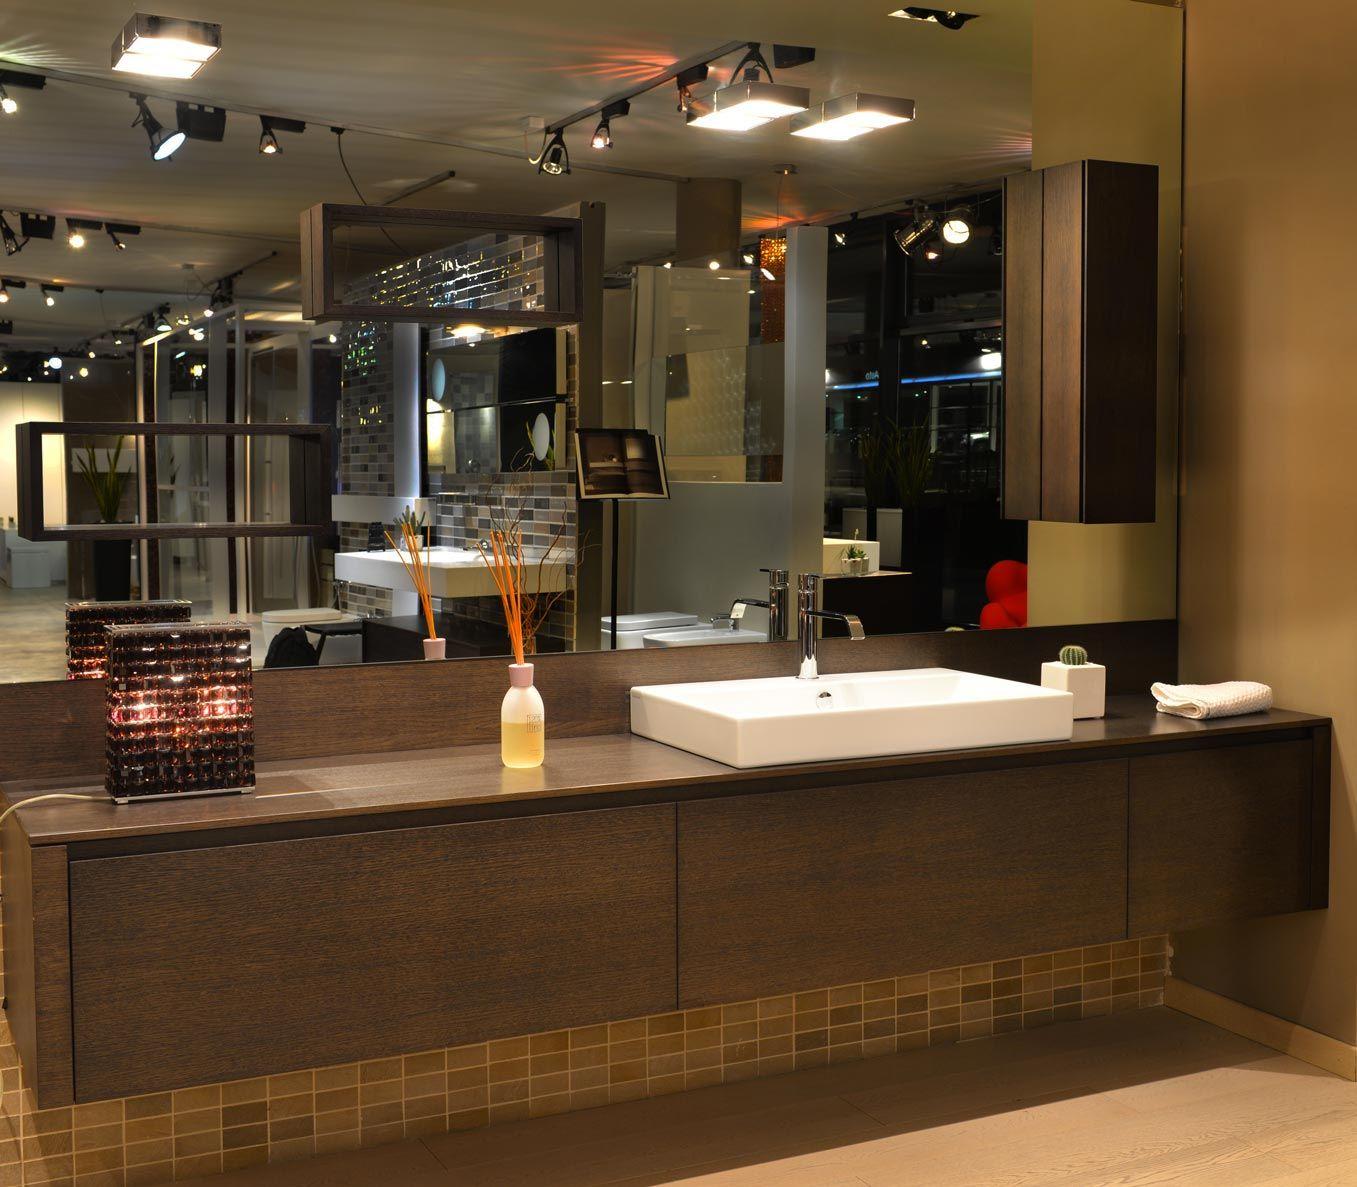 morandi showroom - morandi spa - showroom arredamento casa ... - Rivestimenti E Arredo Bagno